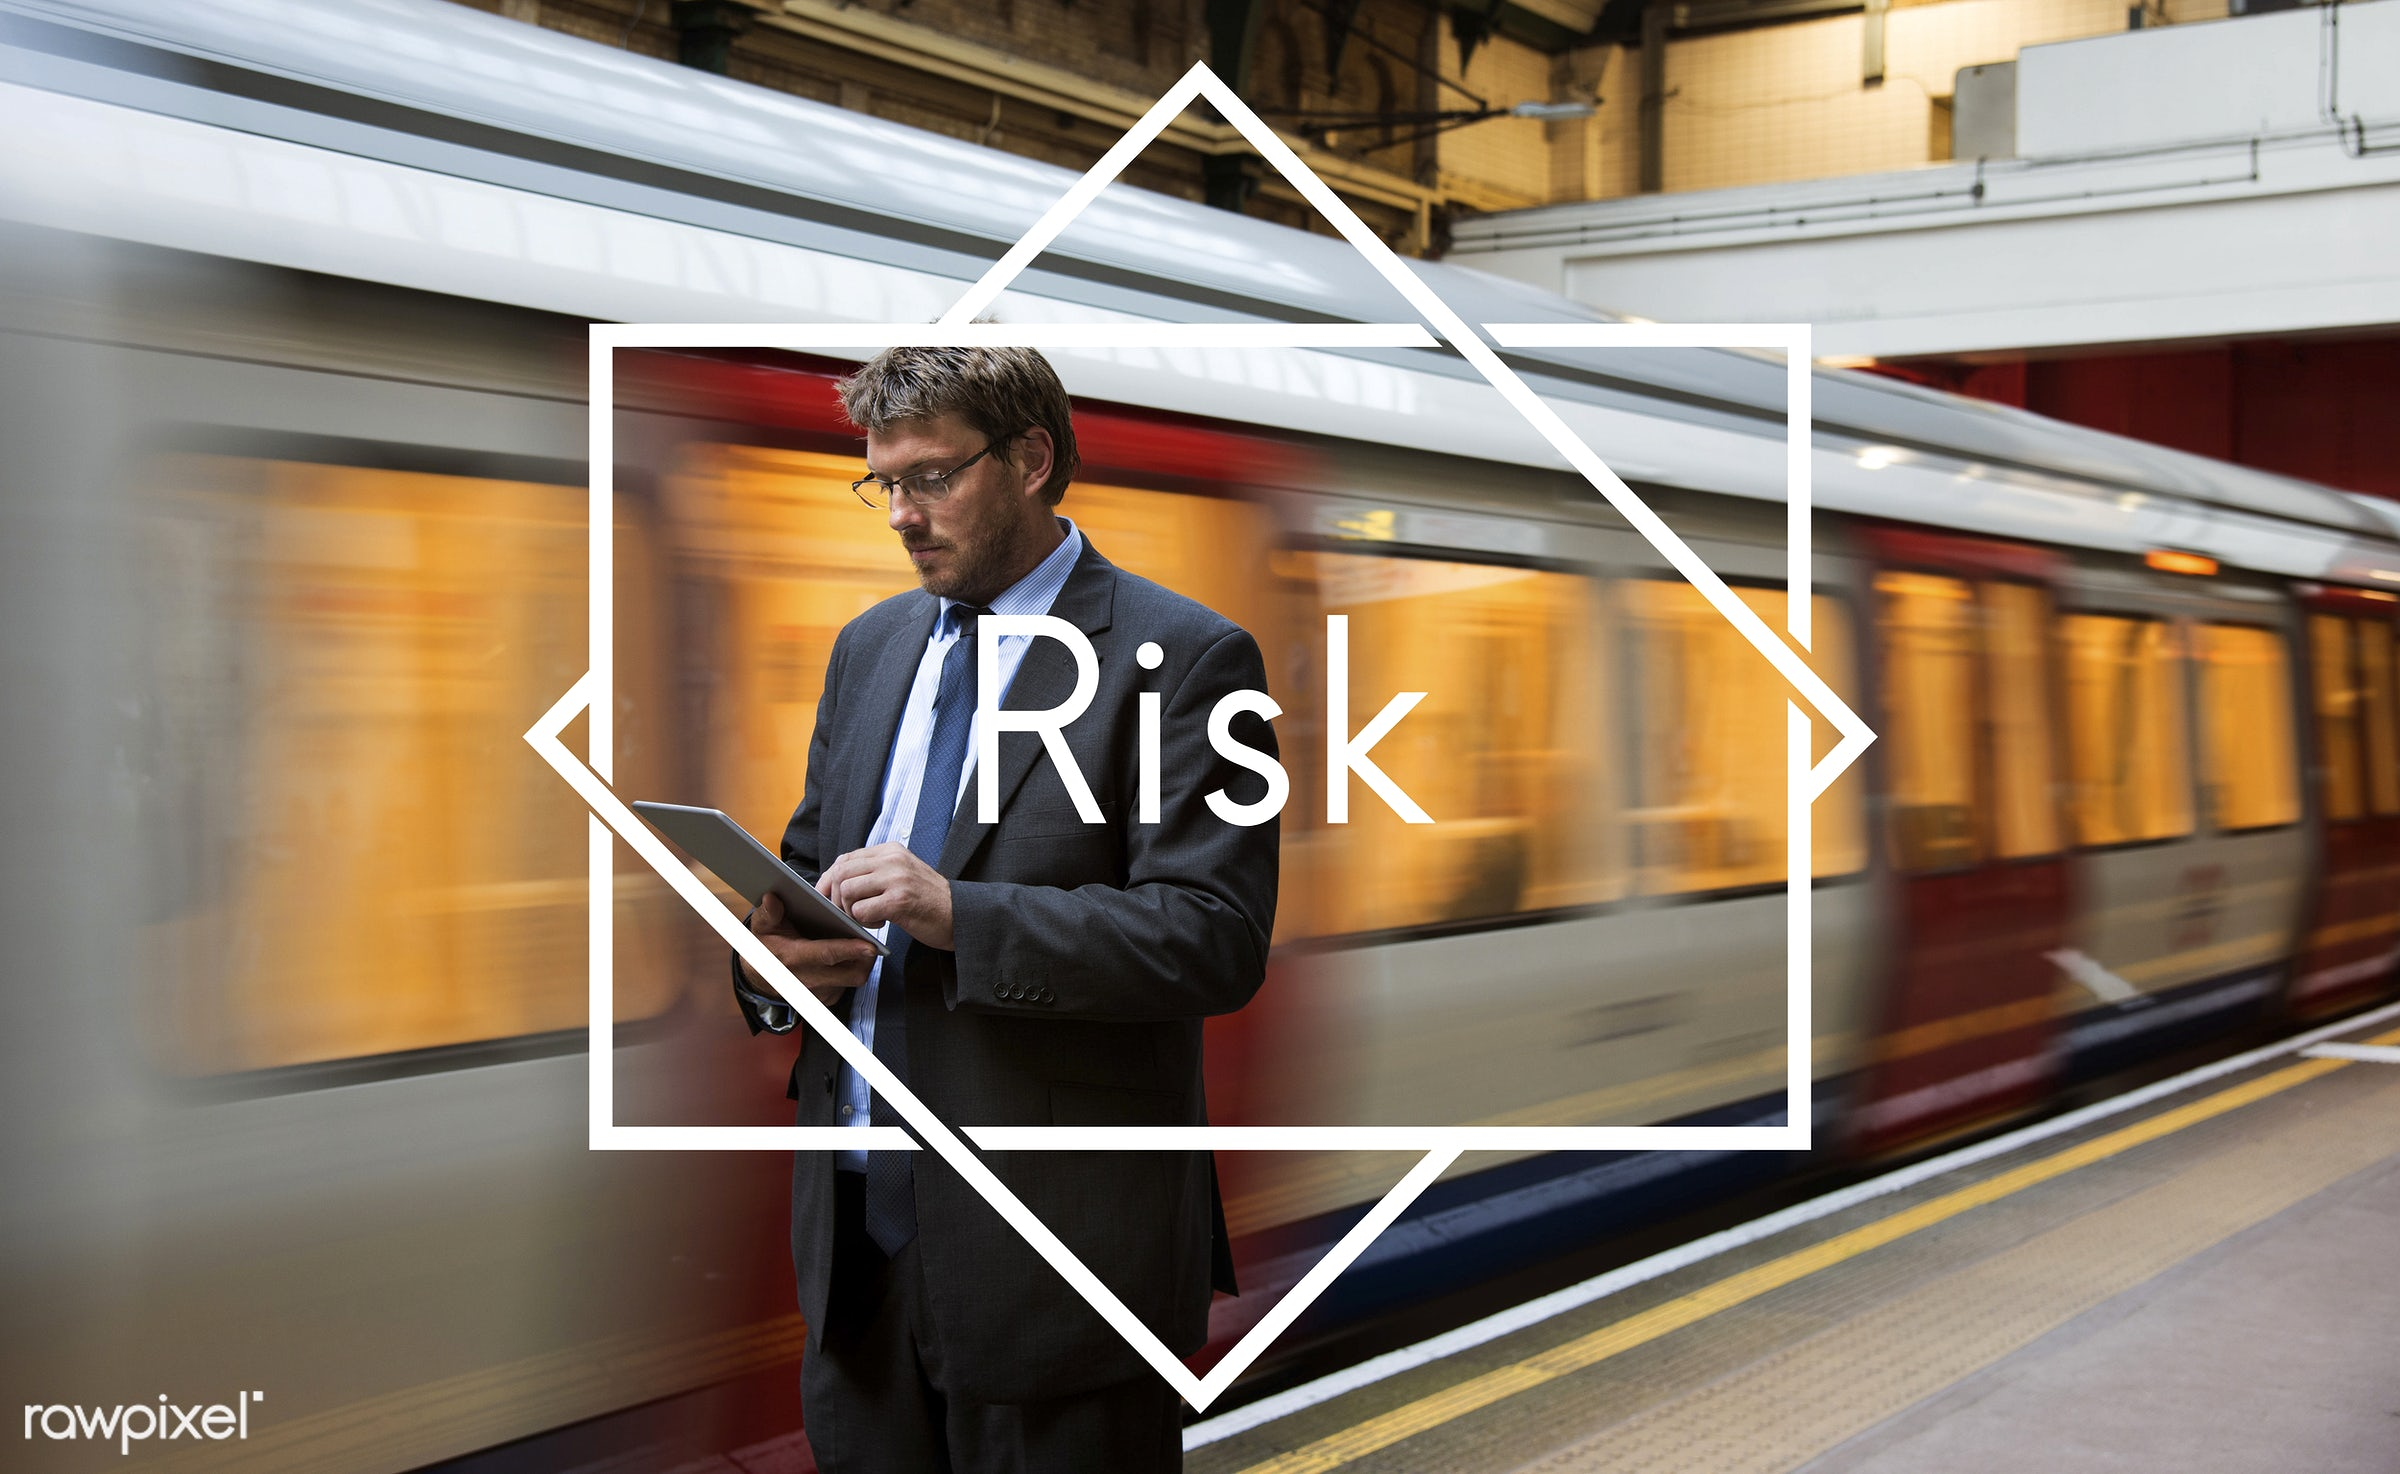 analysis, assessment, business, businessmen, chance, danger, dangerous, device, digital, digital device, digital tablet,...